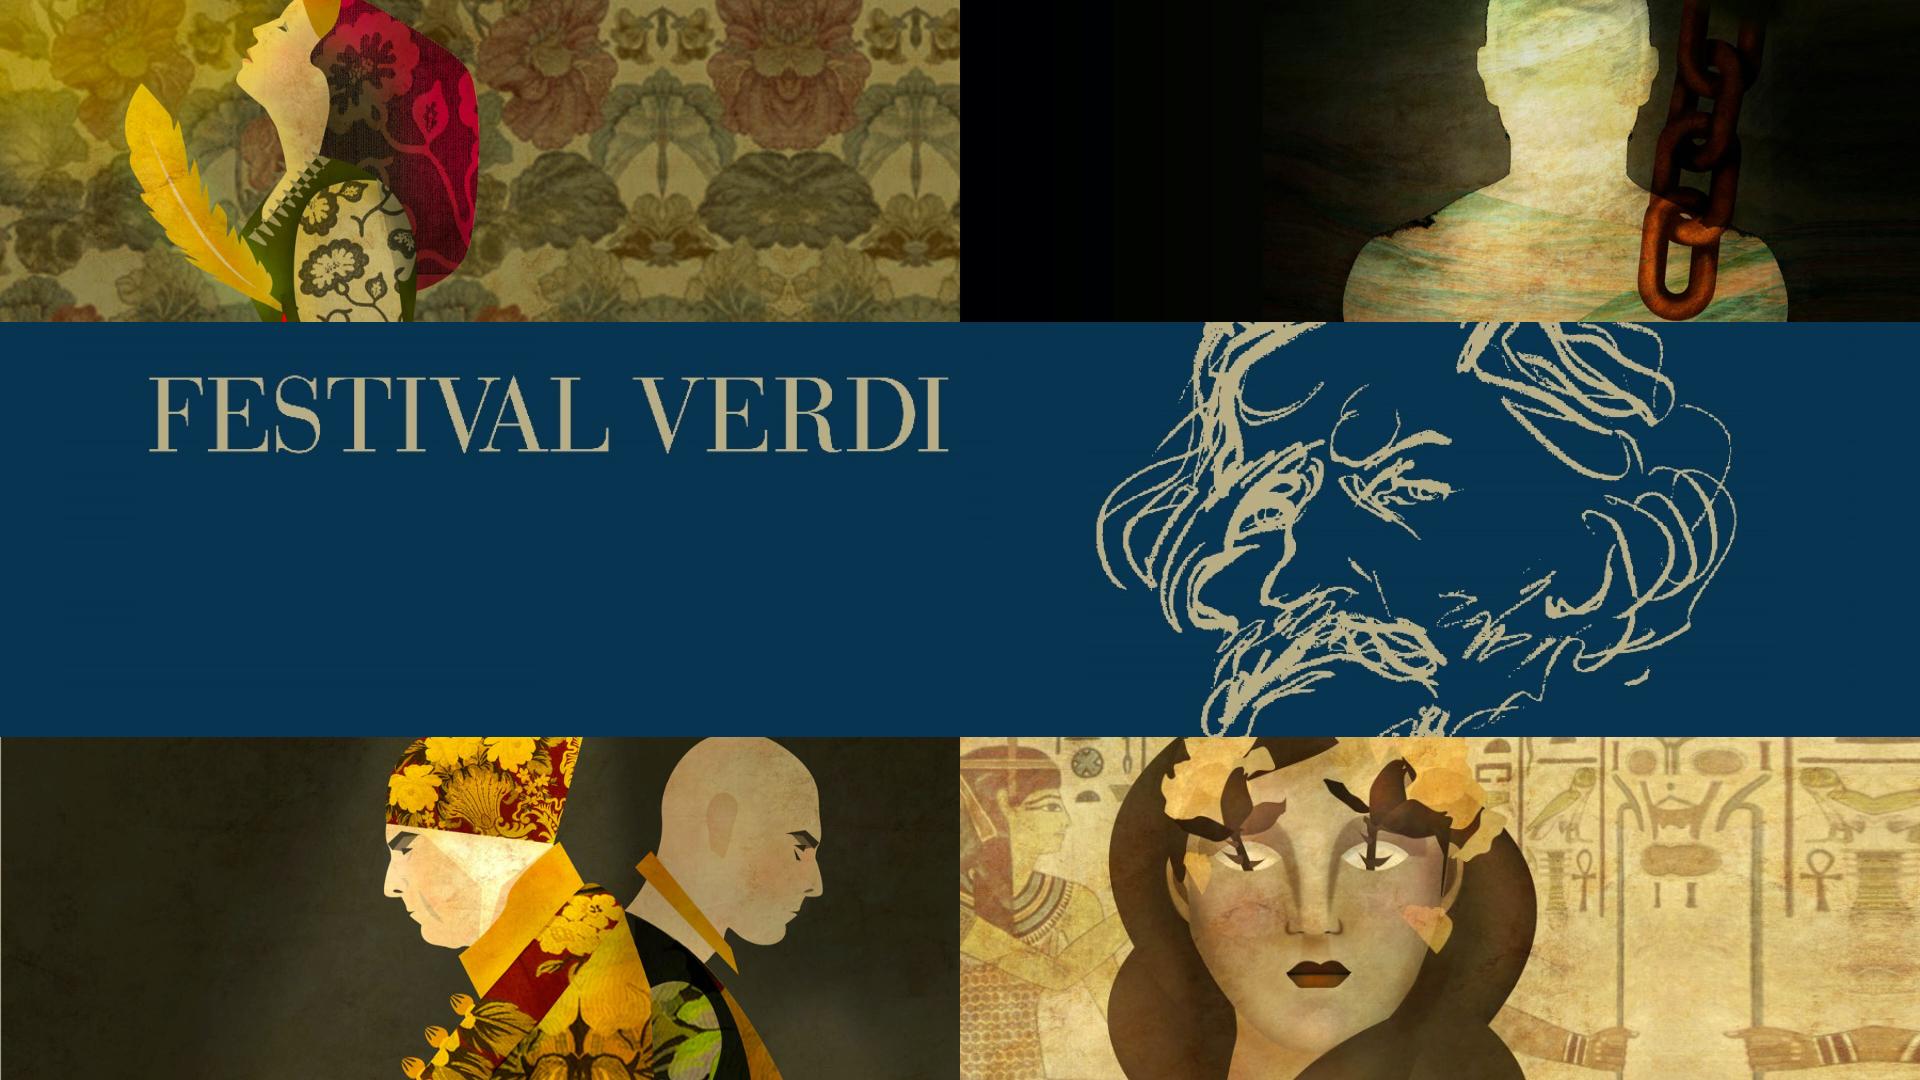 Festival Verdi - Parma e Busseto